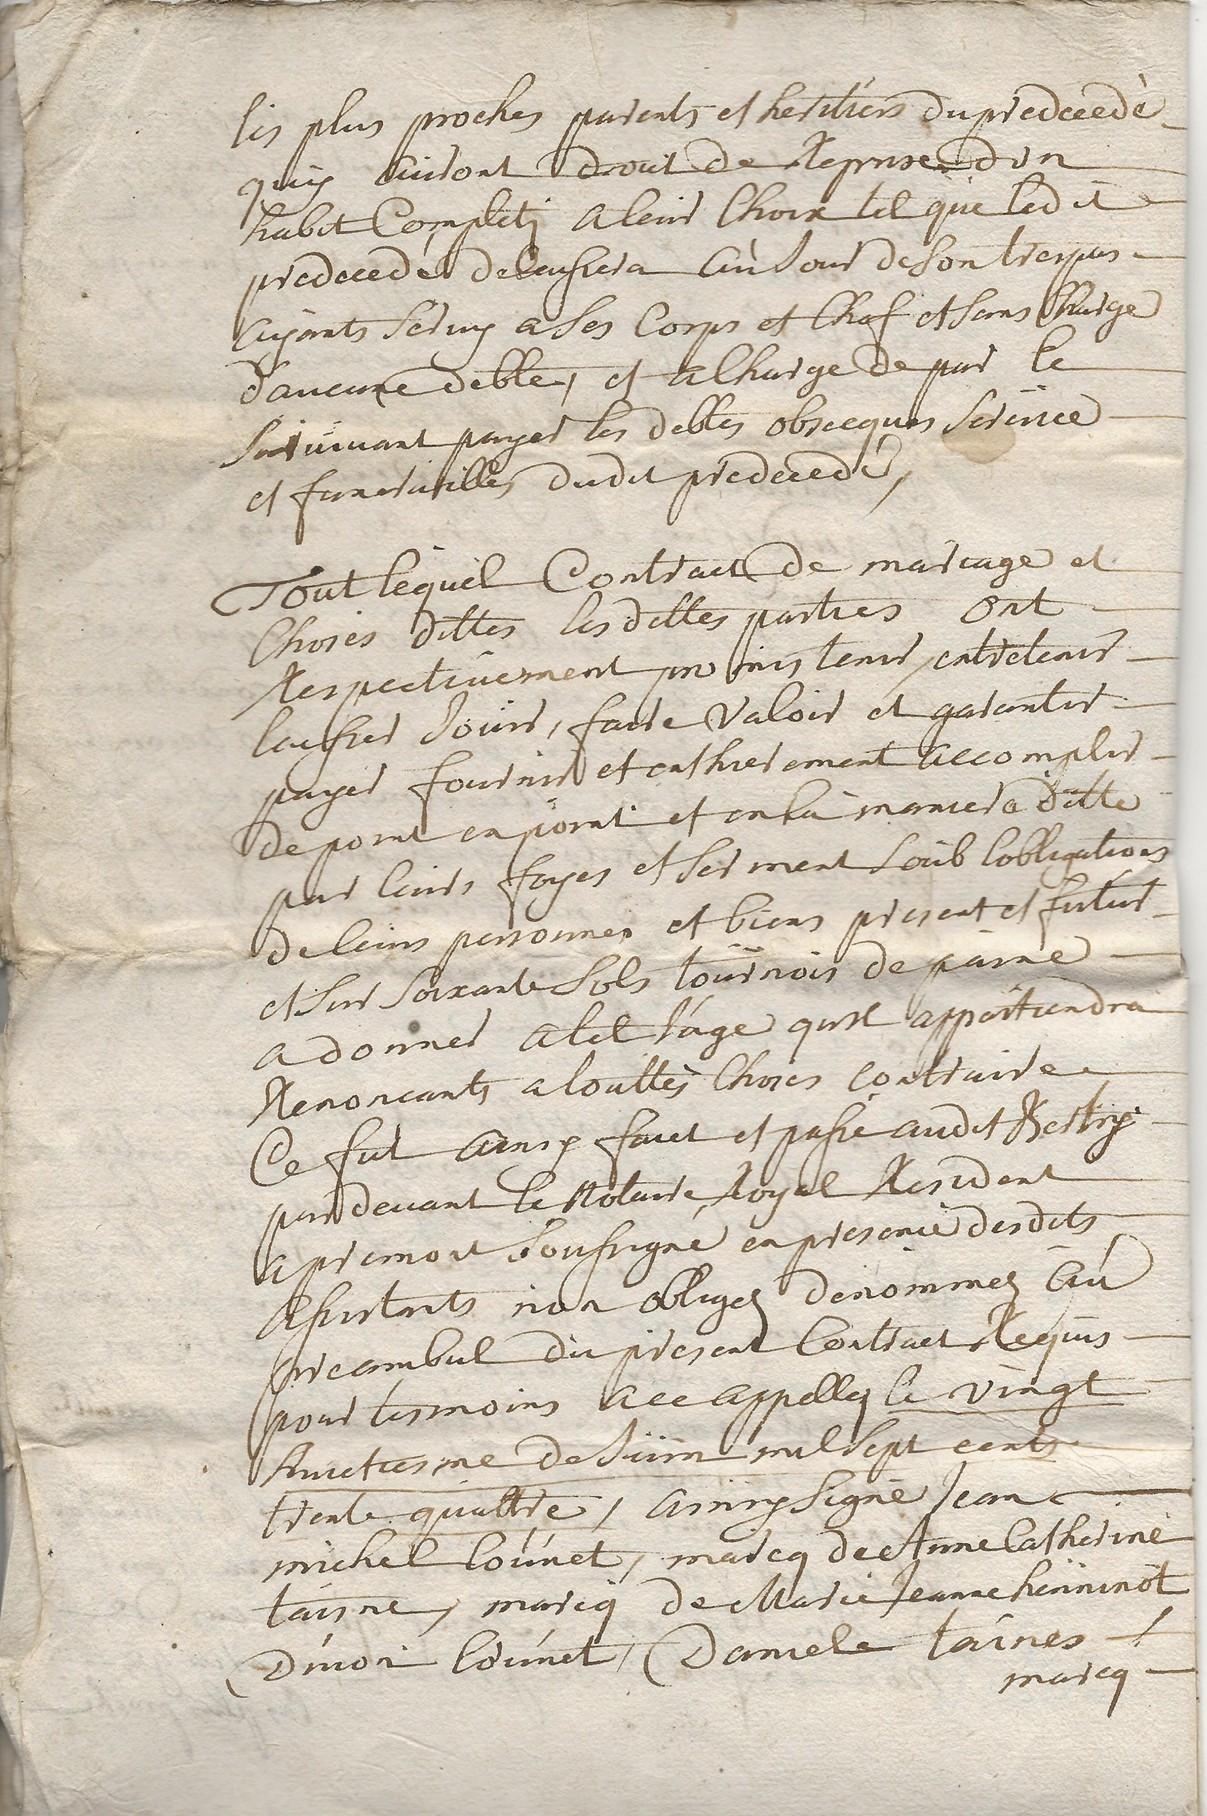 1734 ct mge jmichel louvet x anne catherine taisne 8 9